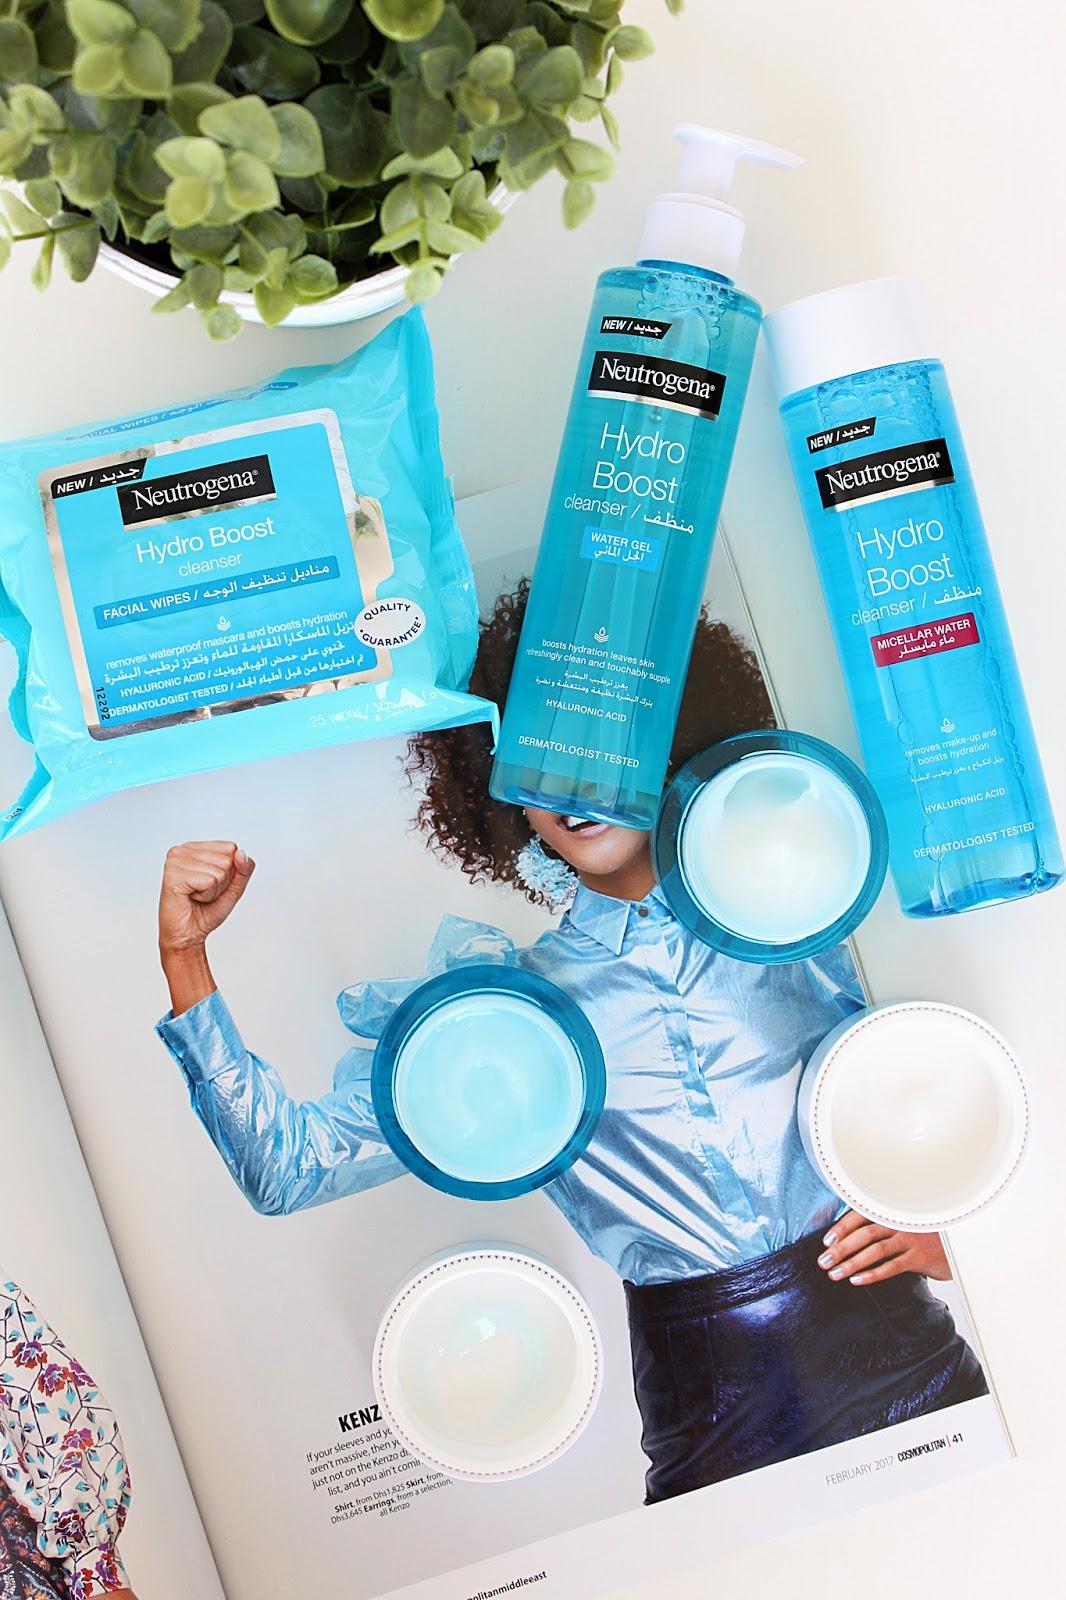 Neutrogena Hydro Boost Skincare Range Review